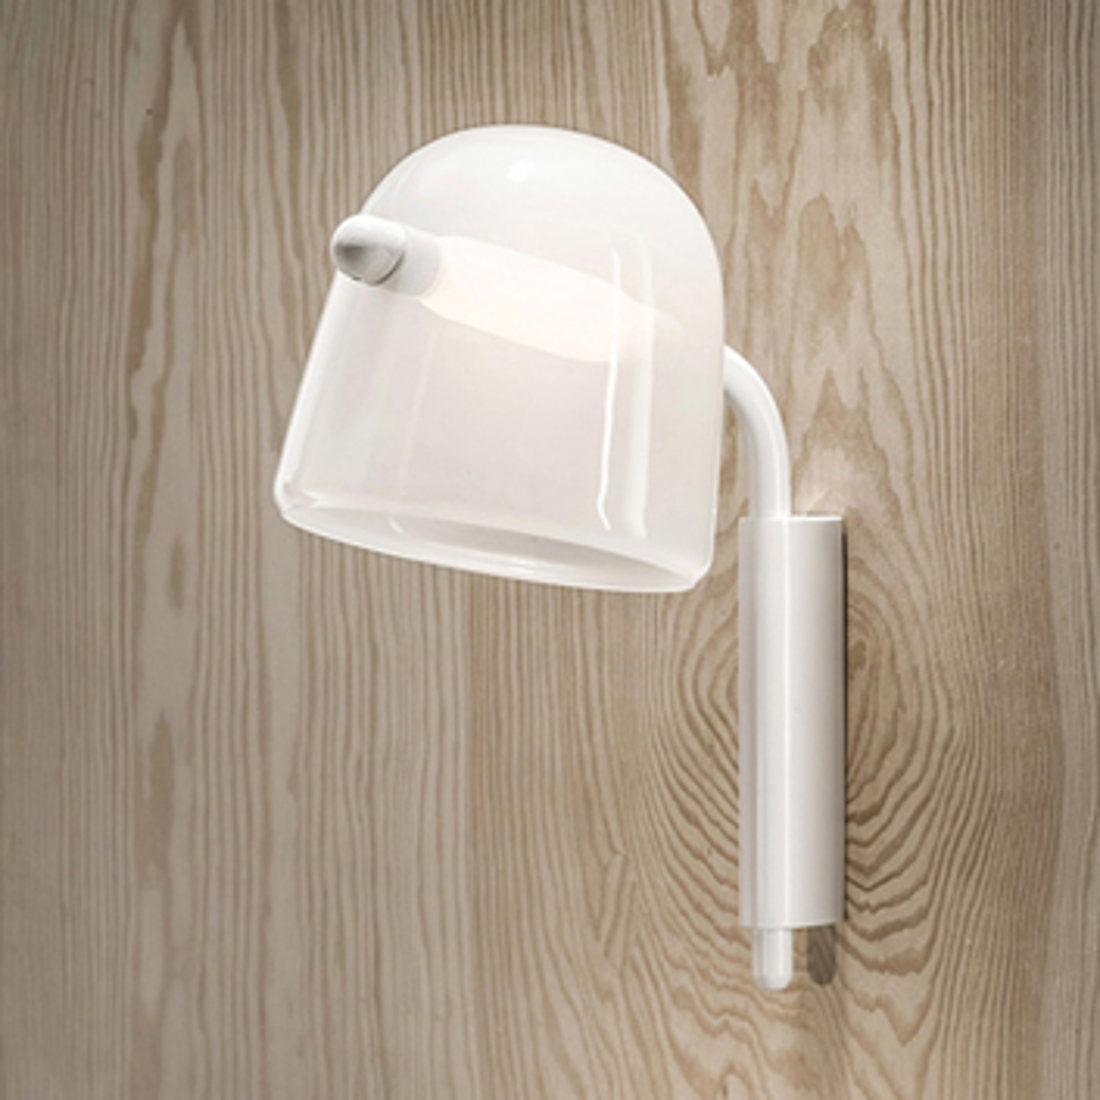 Picture of MONA SMALL ZIDNA LAMPA 34X43,5 cm